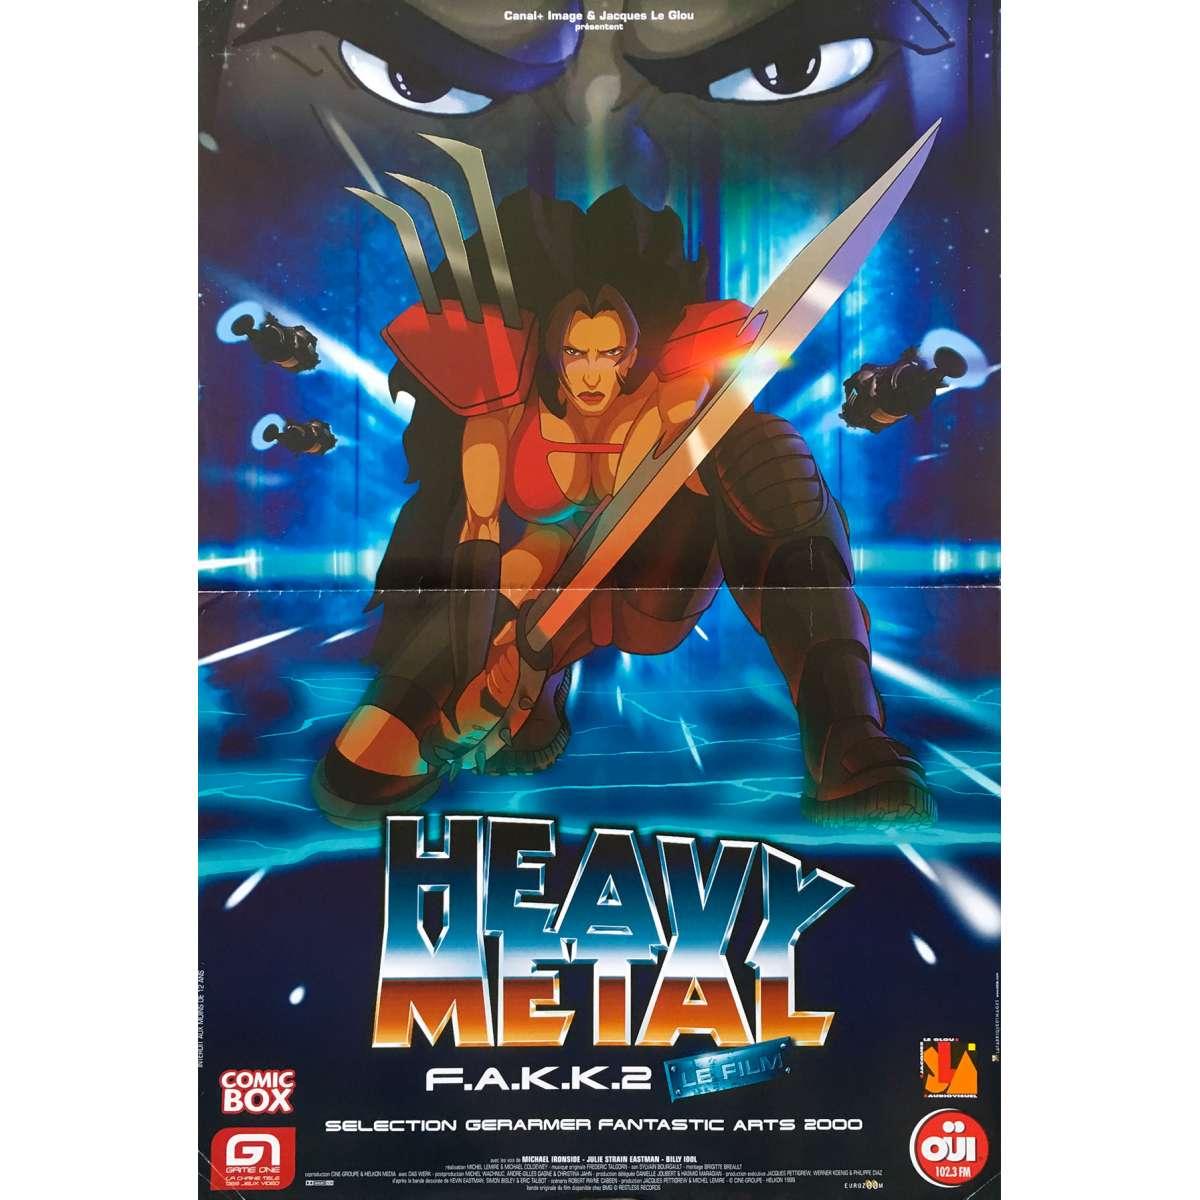 Watch Heavy Metal 2000 (2000) Full Movie Online Free